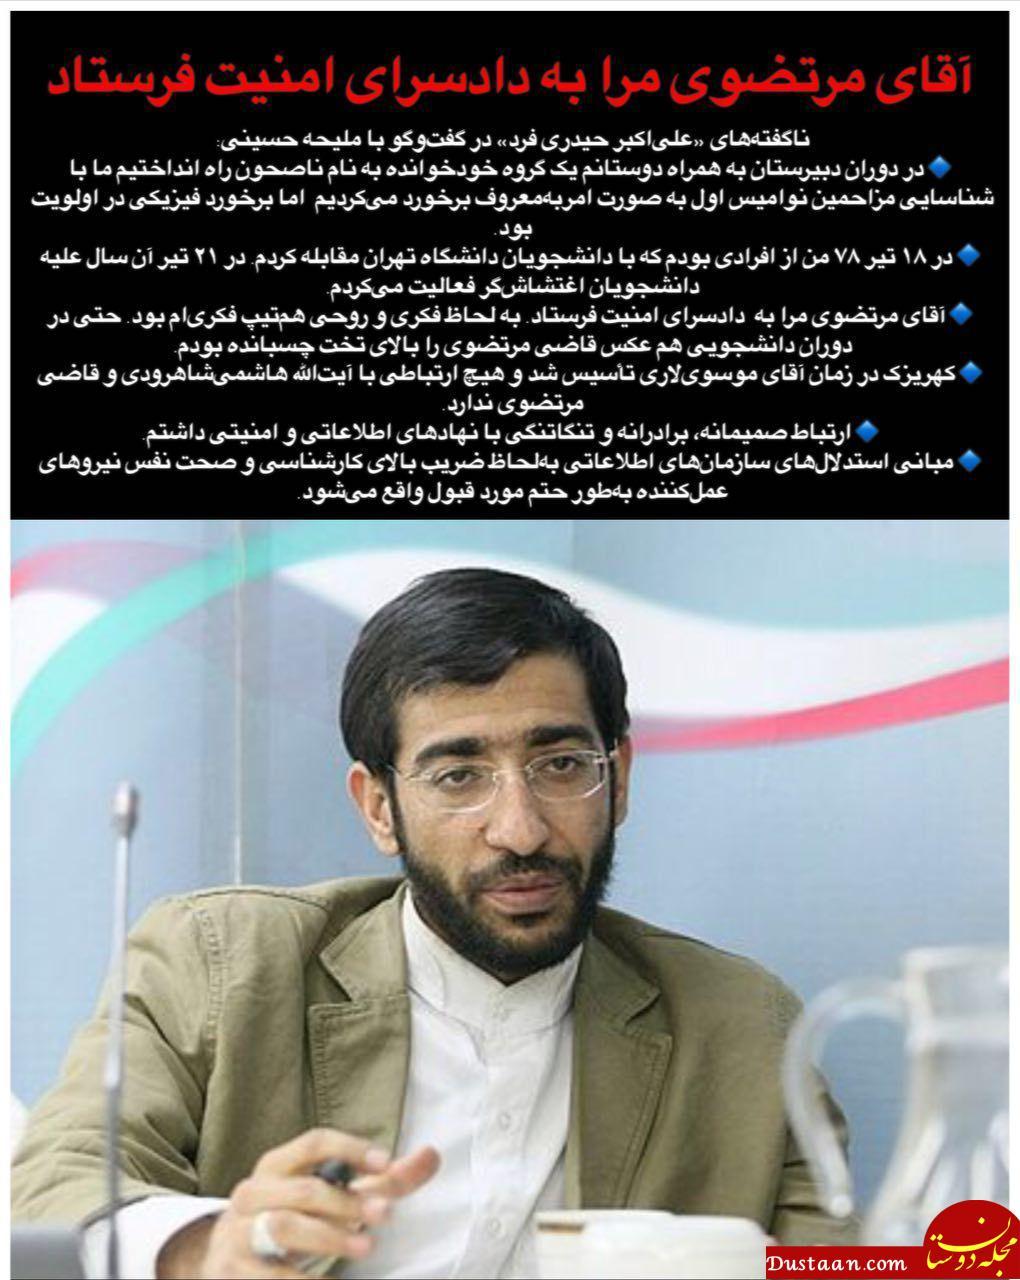 www.dustaan.com ناگفته های قاضی حیدری فرد متهم پرونده جنجالی کهریزک +عکس